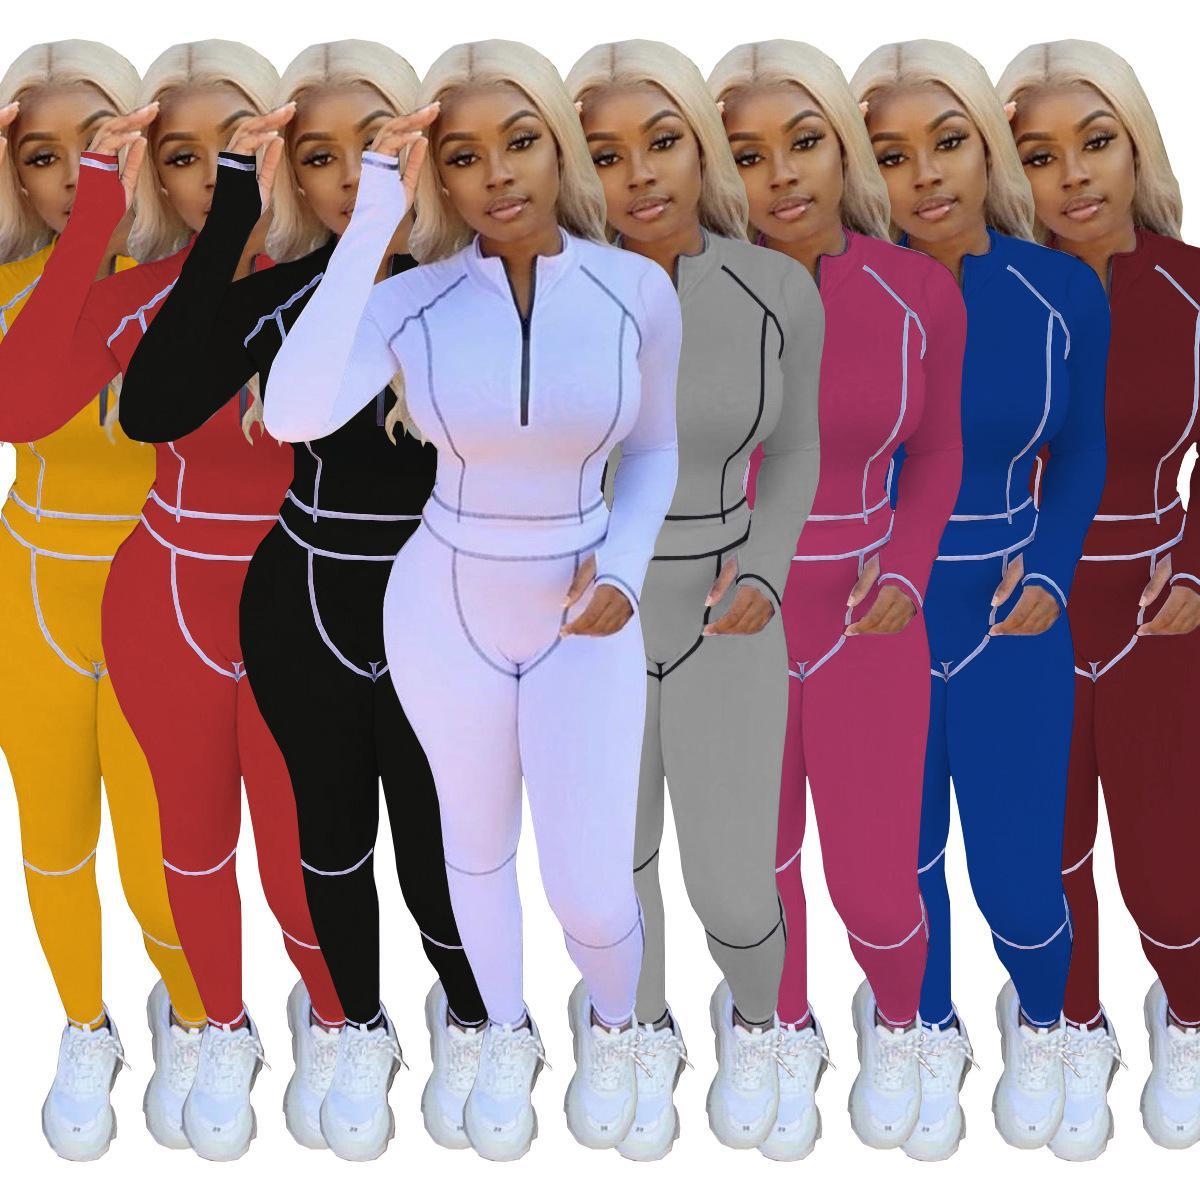 Mujeres Faint Fashion 2020 trajes de manga larga 2 piezas Conjunto de chándales Jogging Sportsuit Camisa Leggings Trajes Sudadera Pantalones Sport Traje